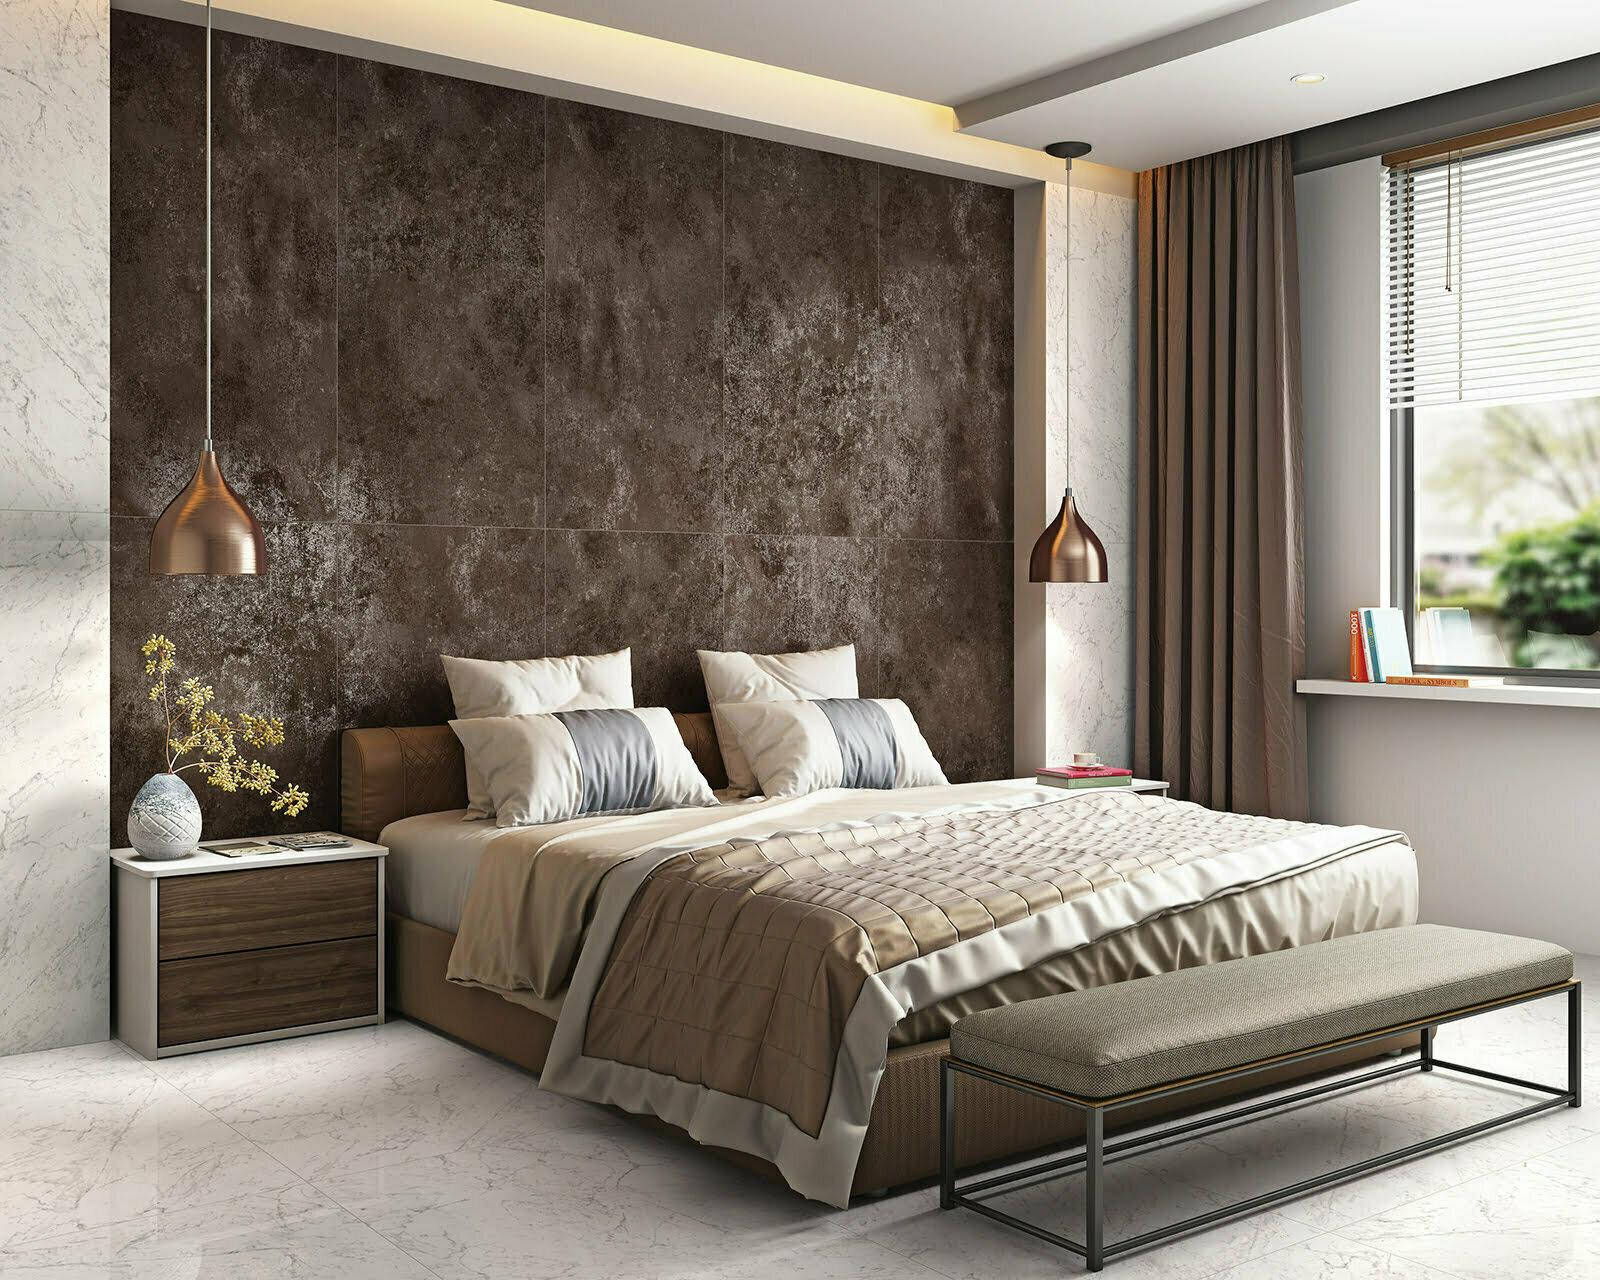 mars metallic large format metallic effect porcelain wall floor tile 60x120cm in 2 colours